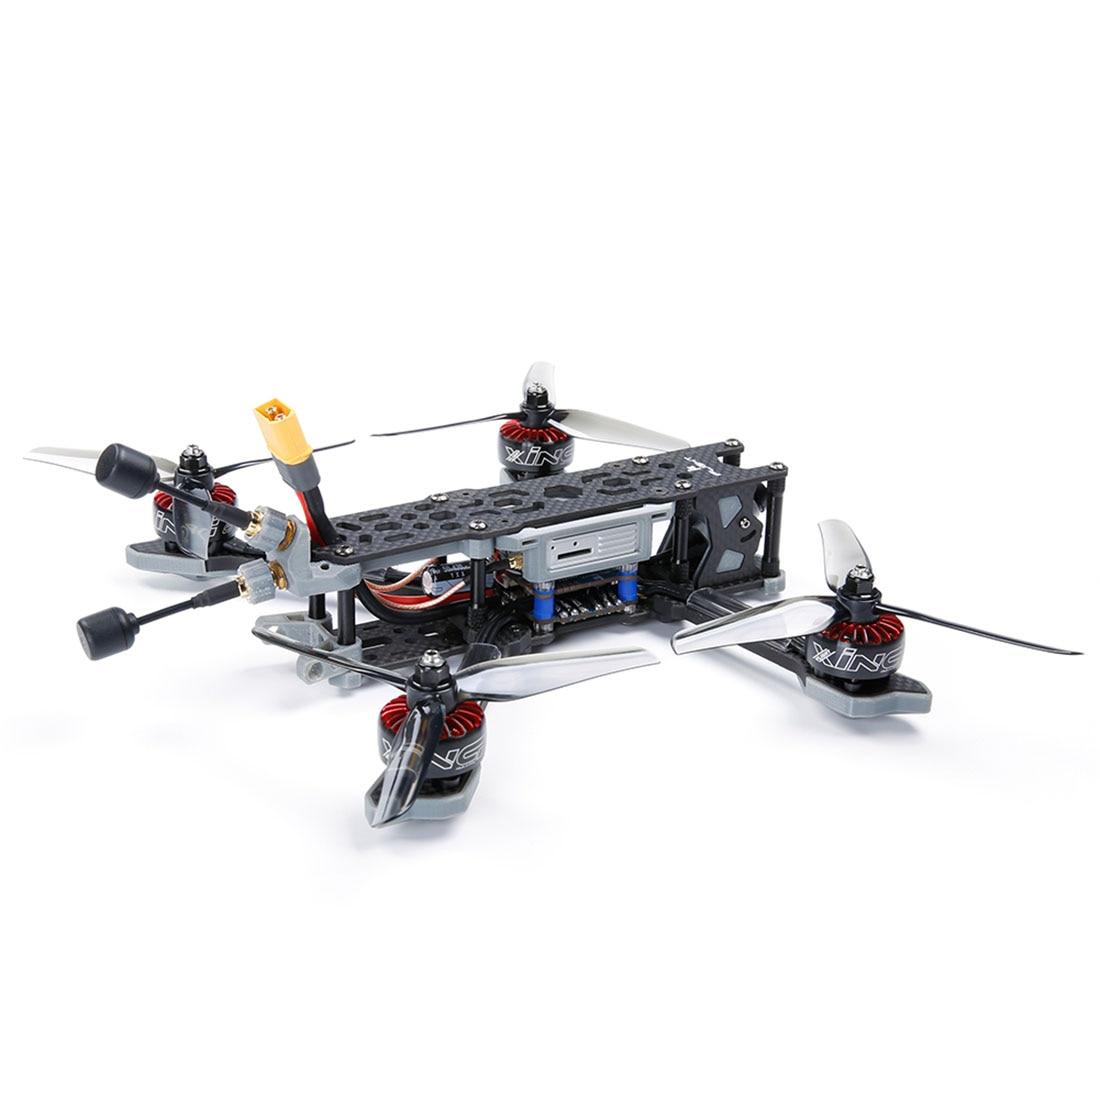 IFlight TITAN DC5 5 zoll 222mm 4 s/6 s HD FPV Racing Drone BNF SucceX D f7 50A Stapel XING E 2207 2450/1800KV Motor Hubschrauber Spielzeug - 4